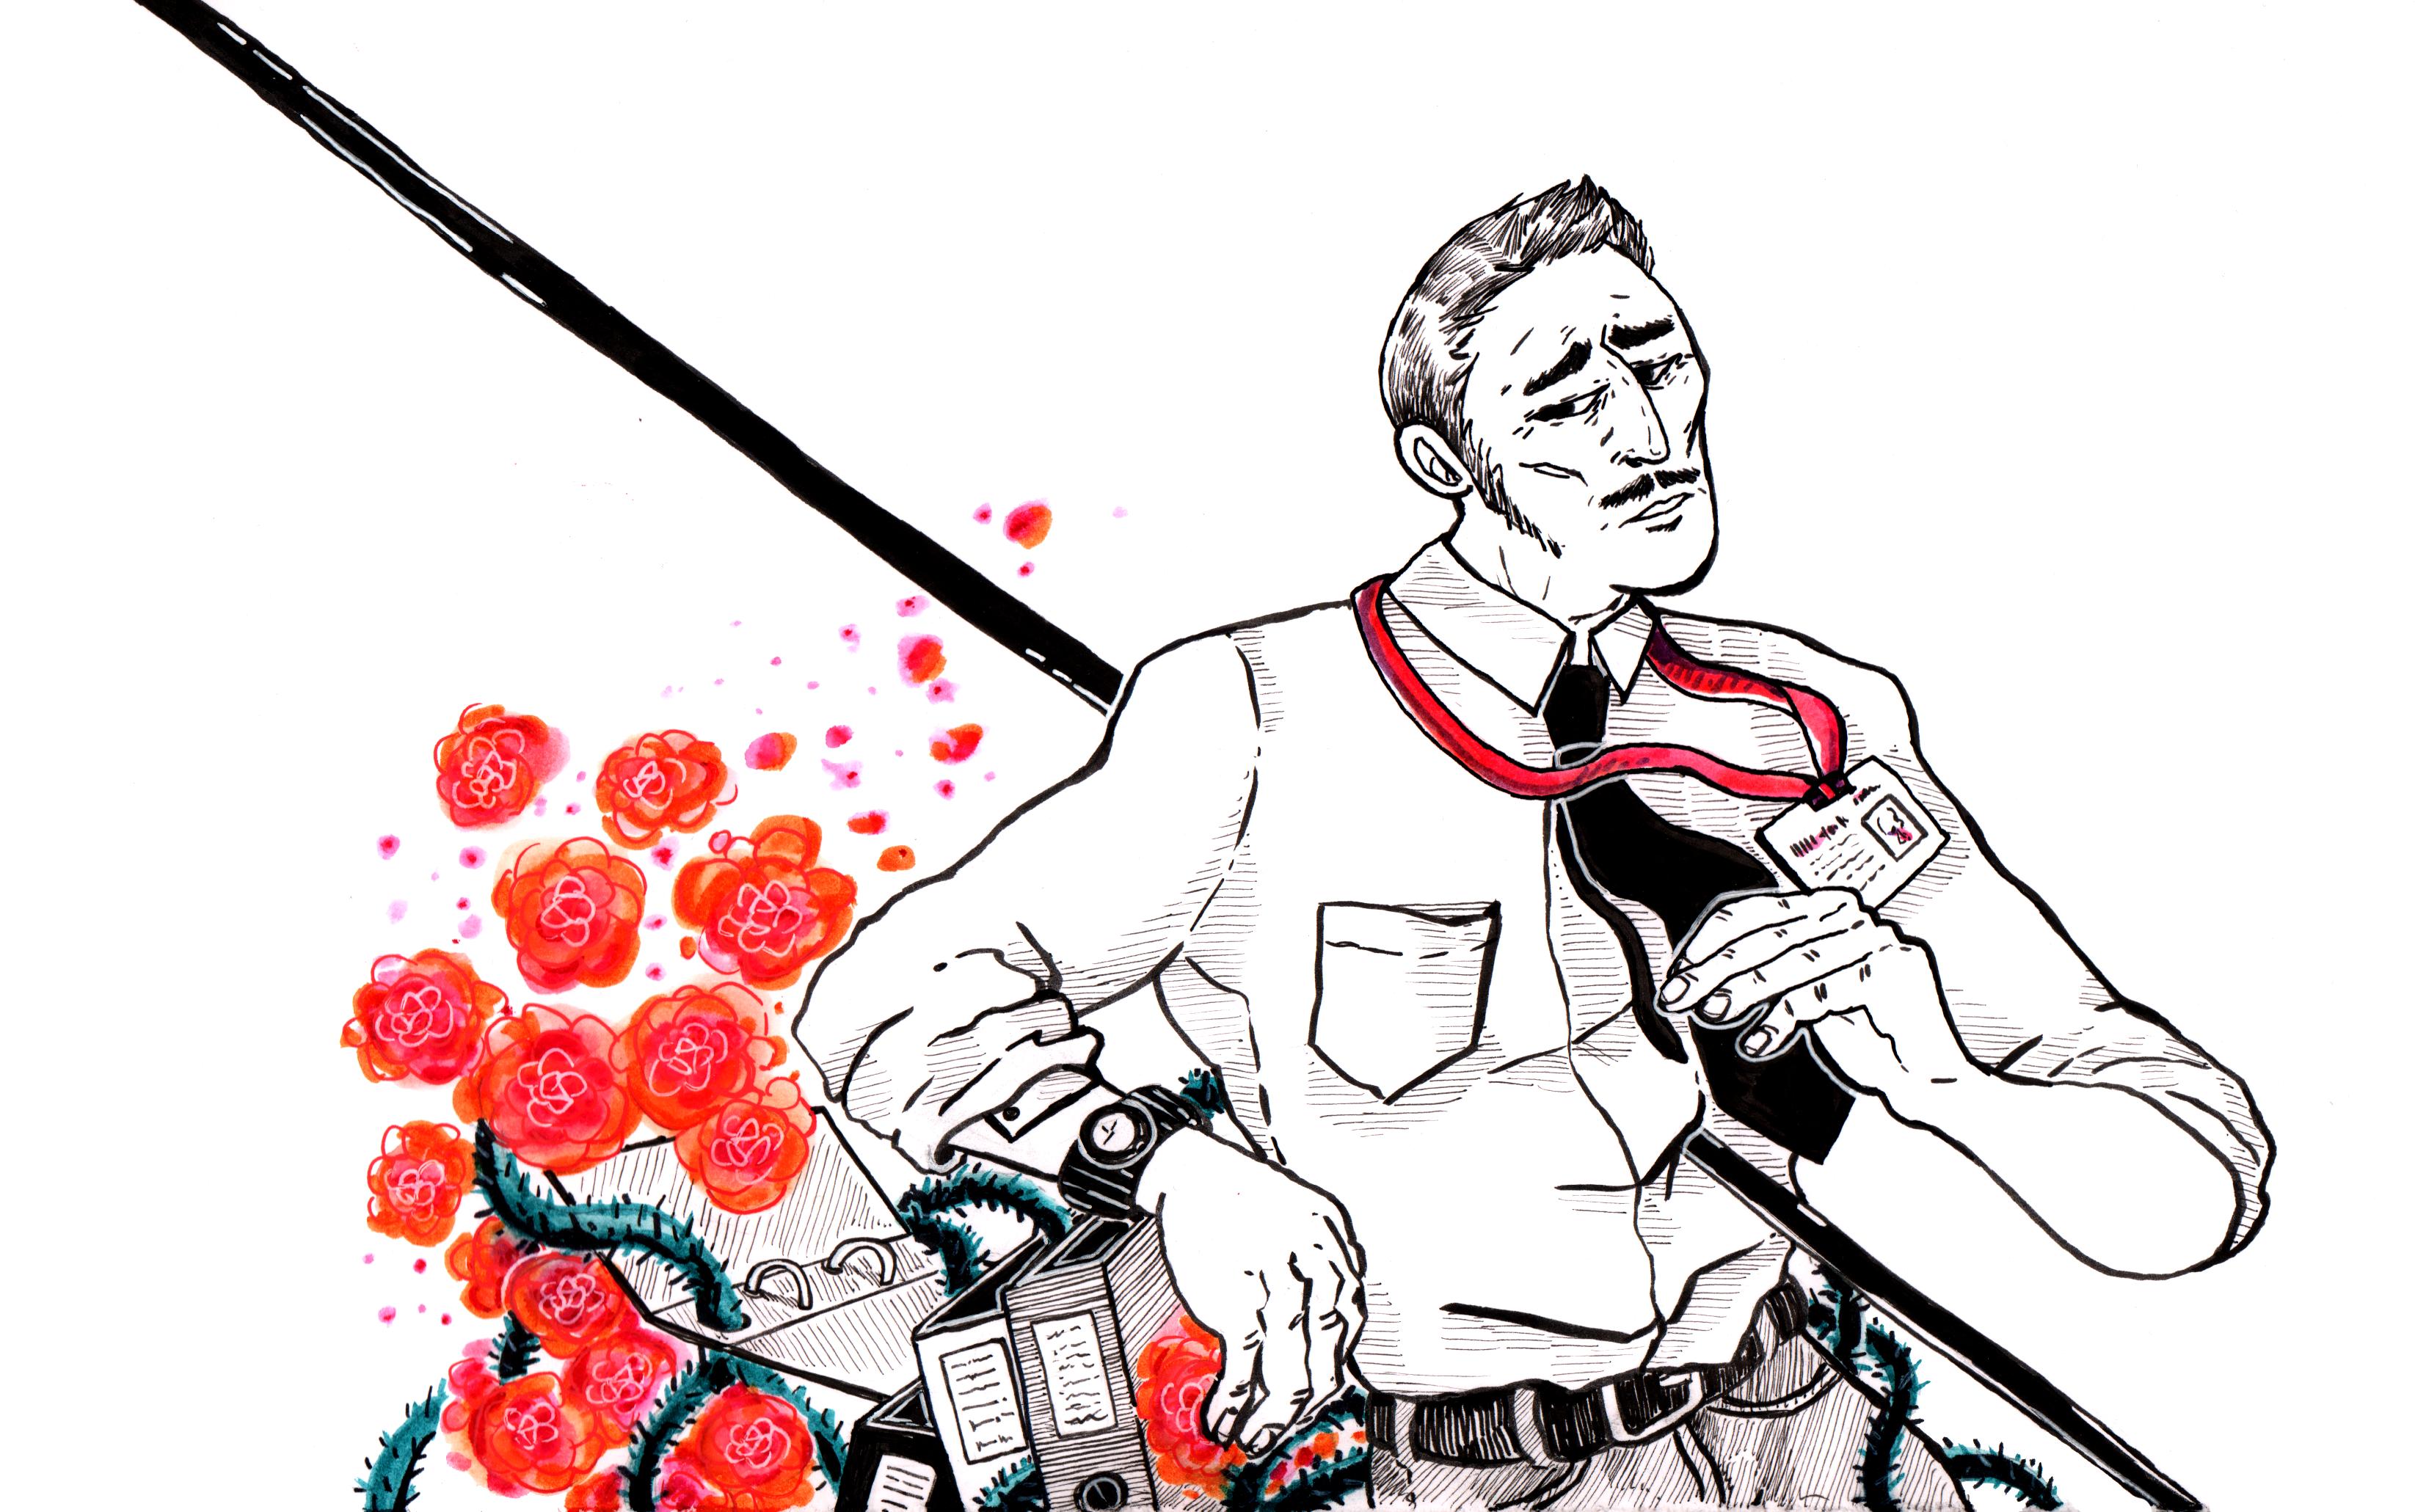 illustration, red, black and white